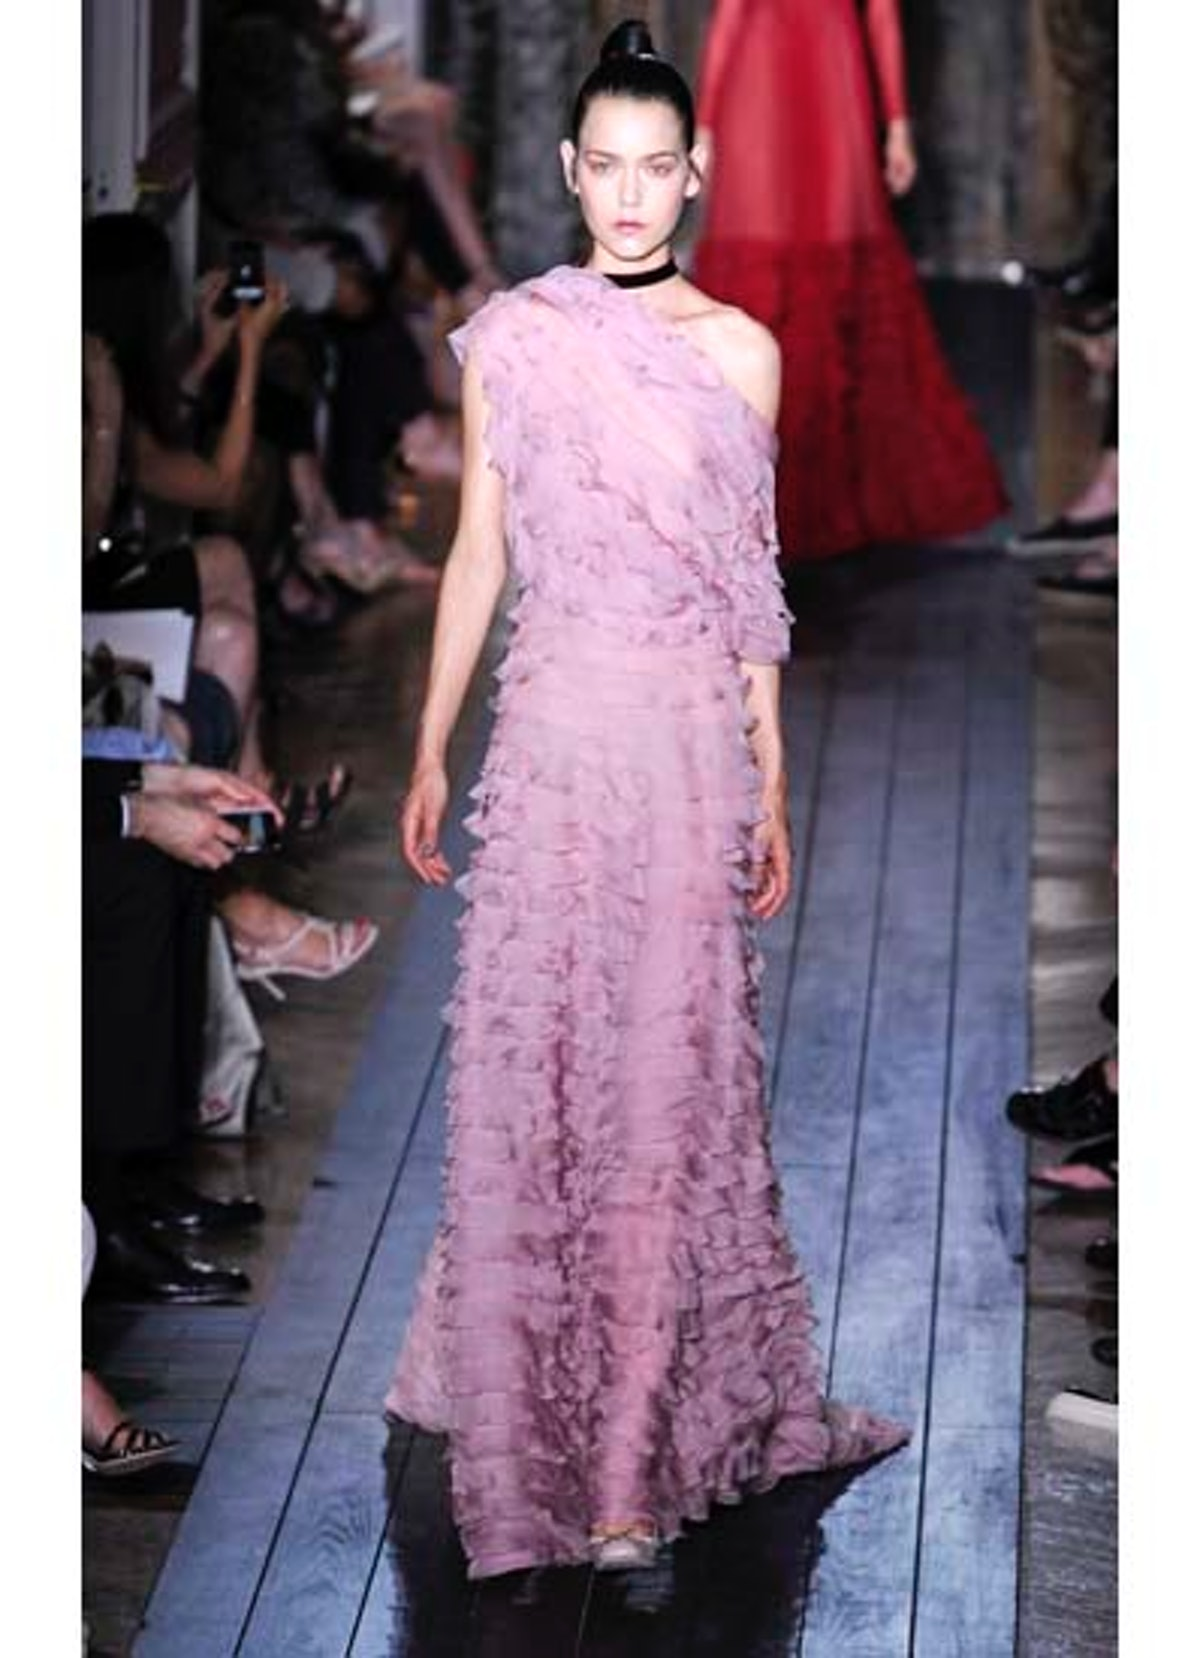 fass-valentino-couture-2012-runway-36-v.jpg